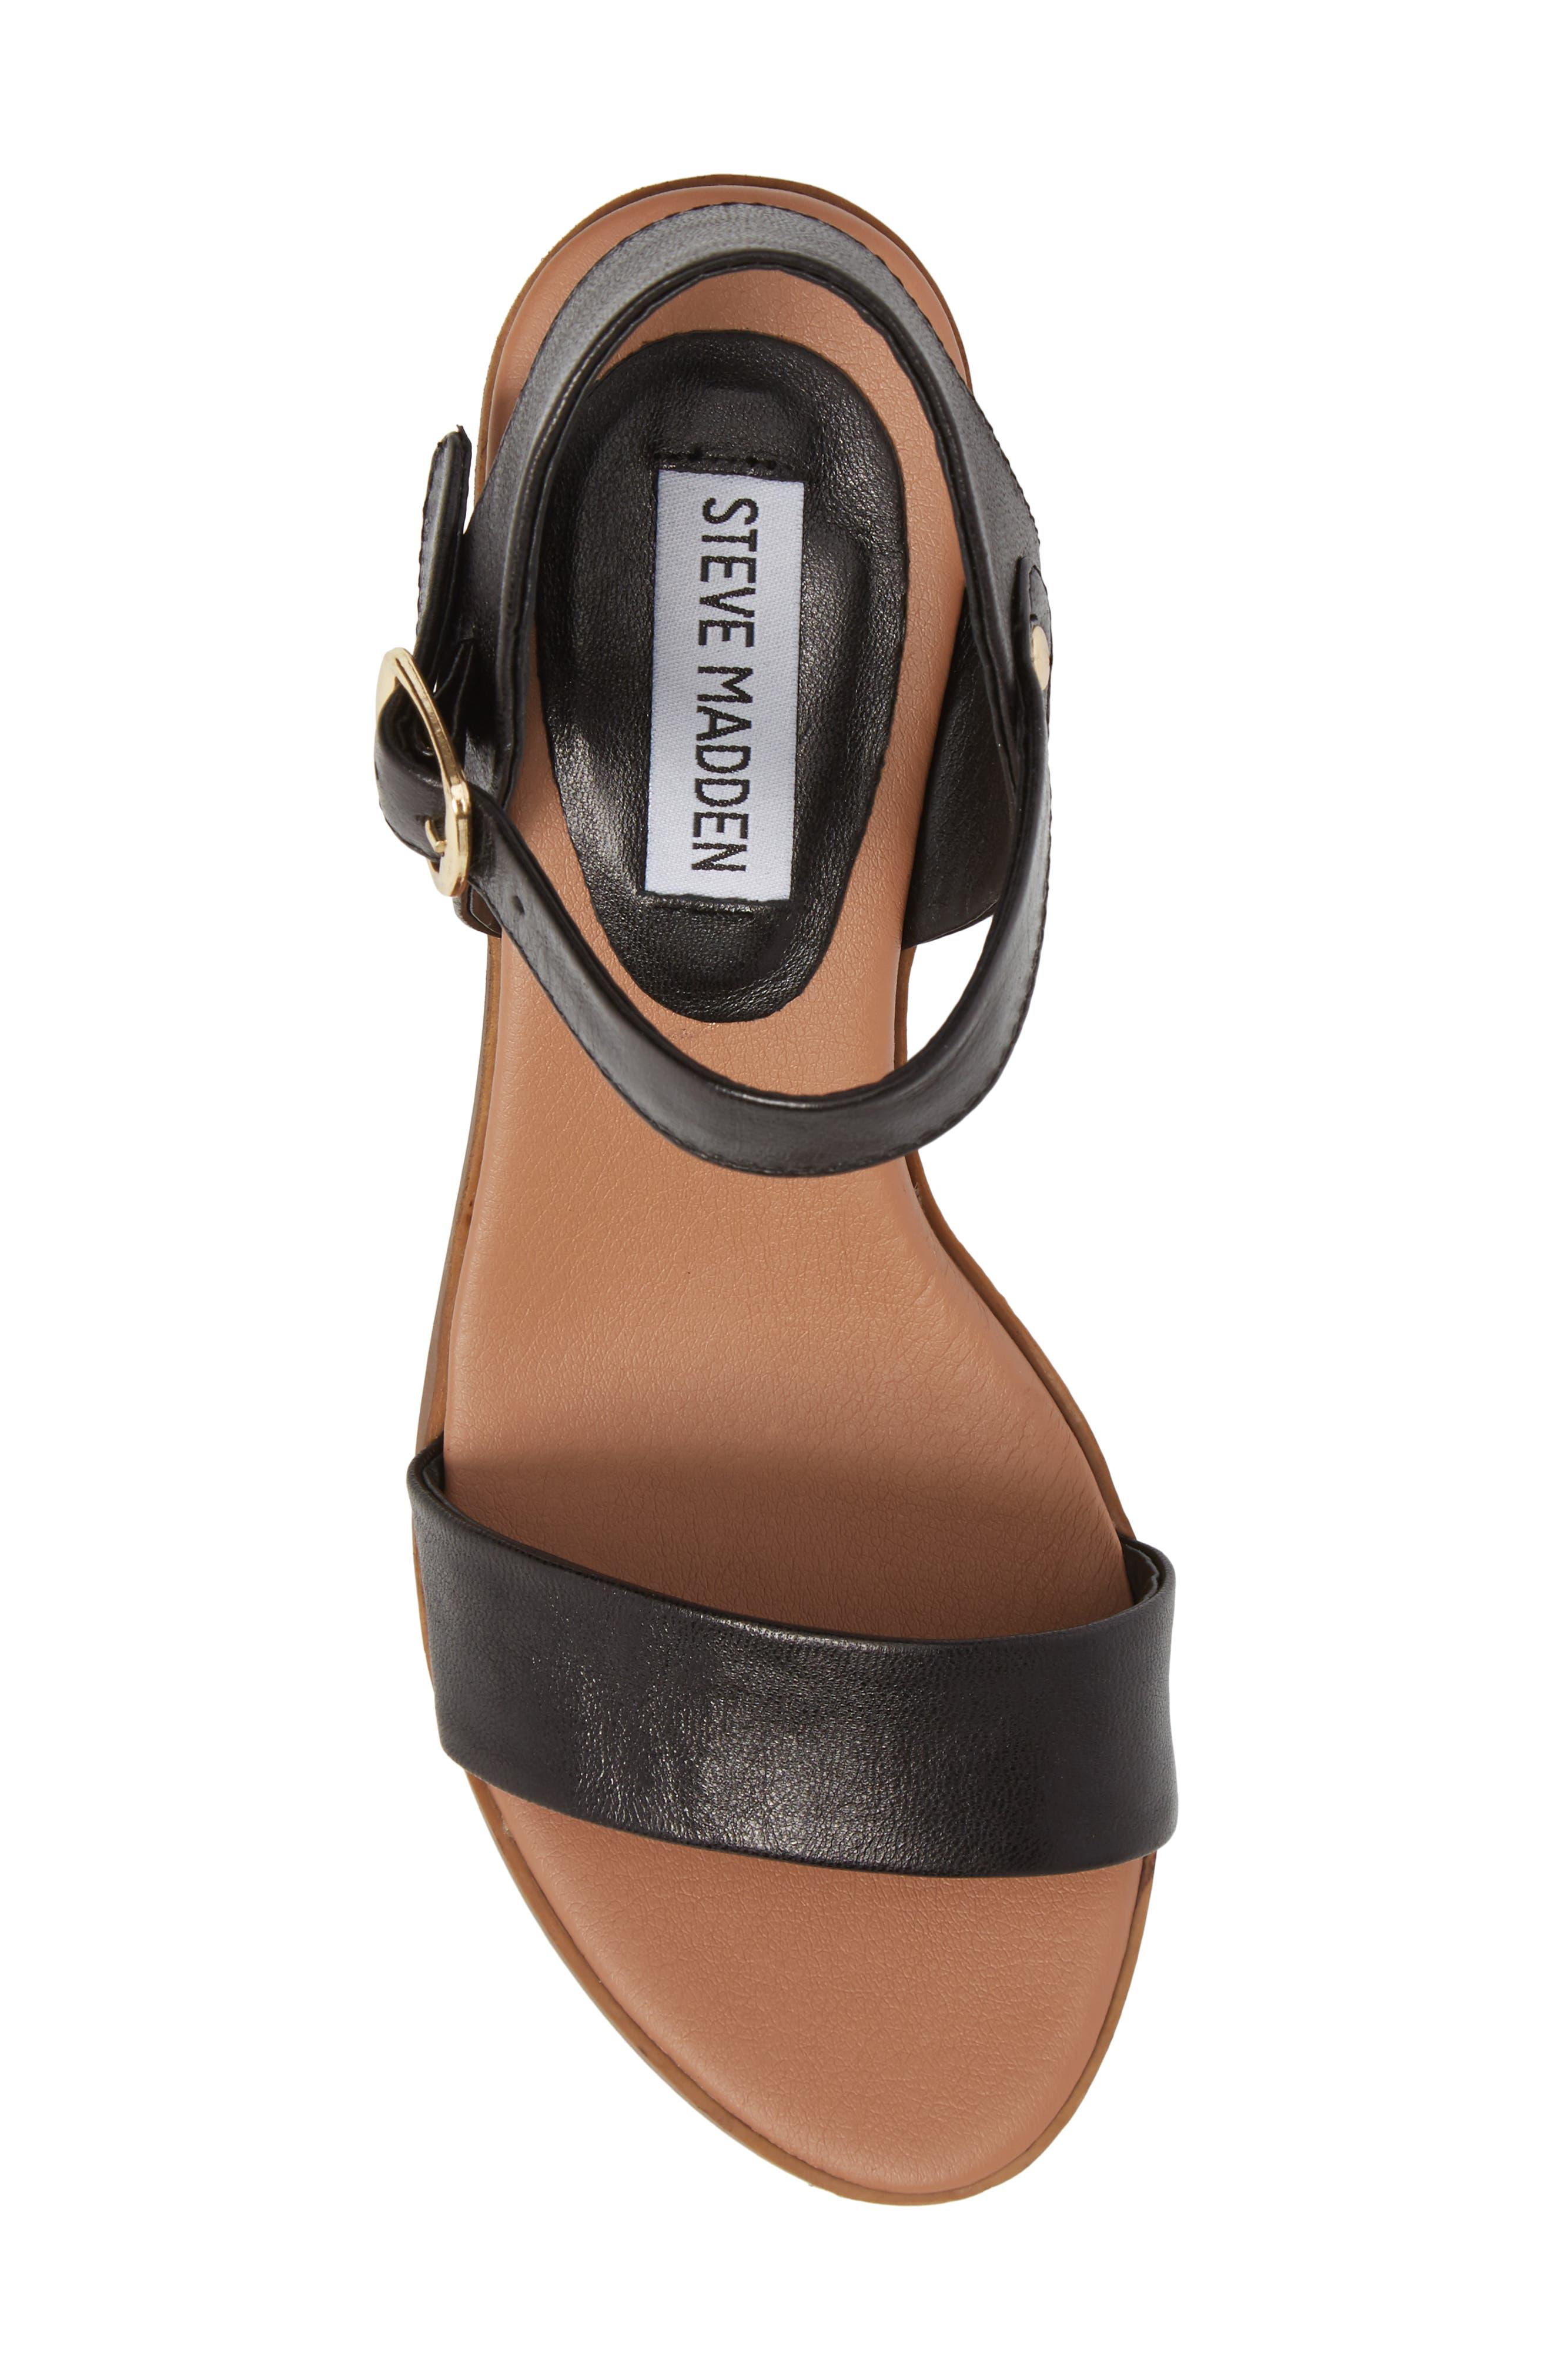 April Block Heel Sandal,                             Alternate thumbnail 5, color,                             BLACK LEATHER